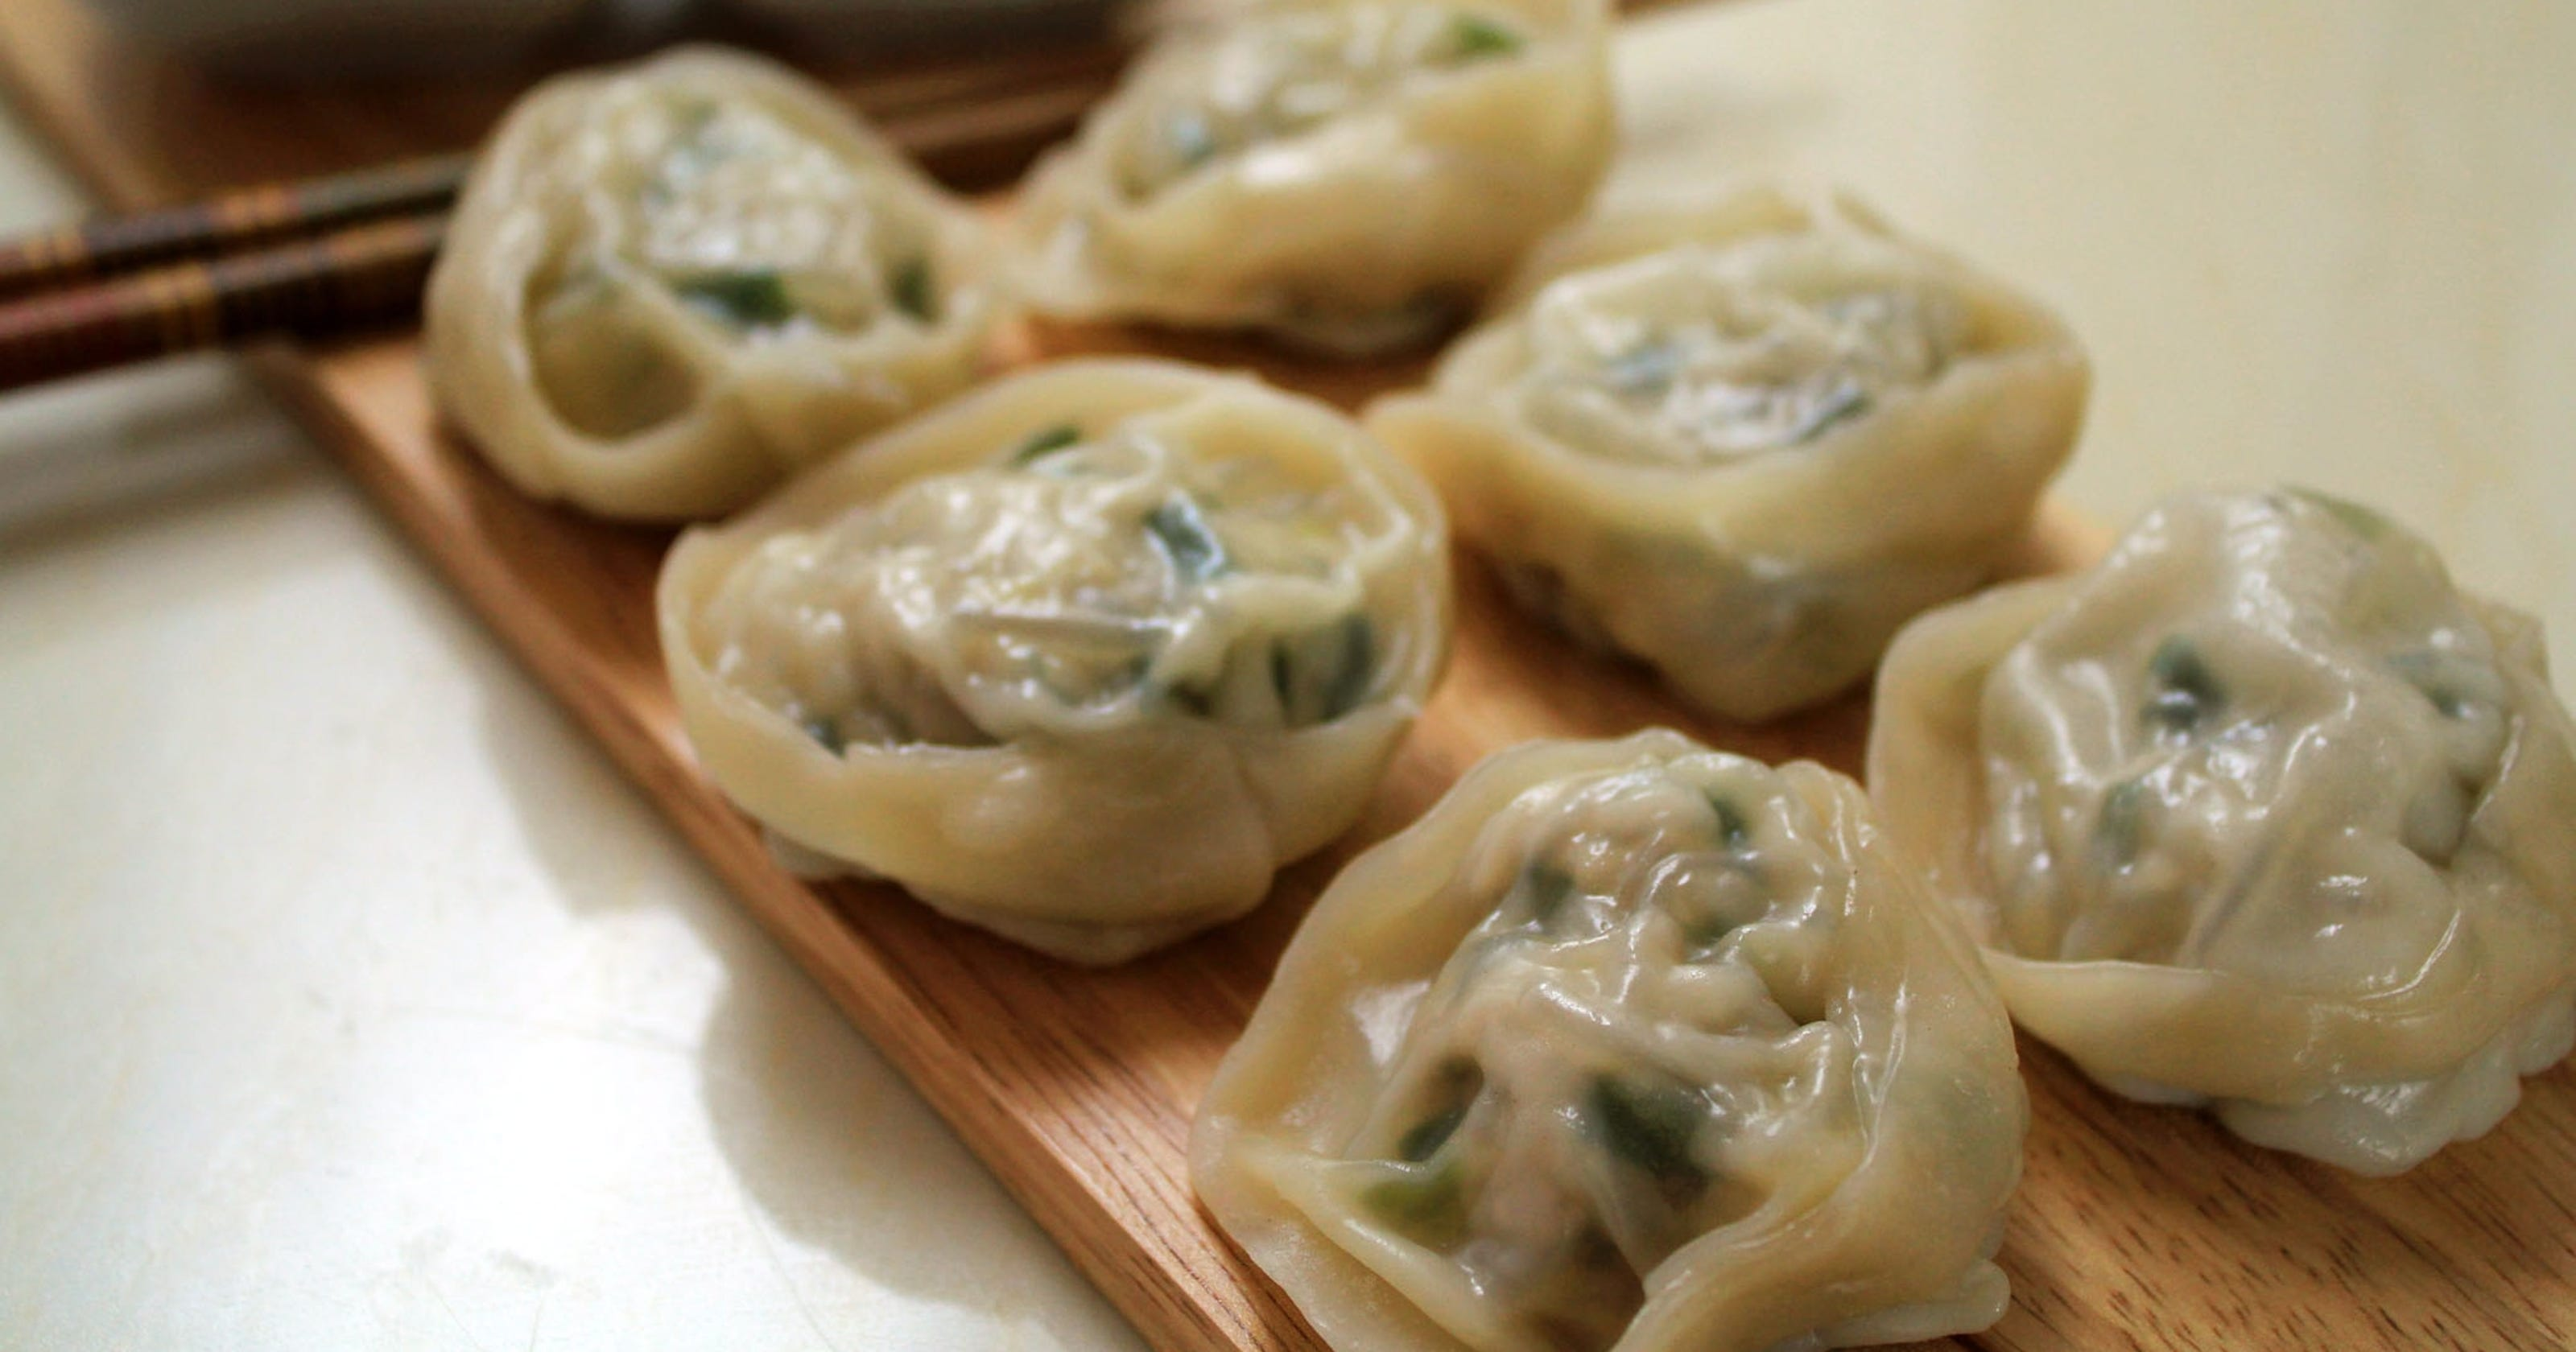 Around the world in 13 dumplings